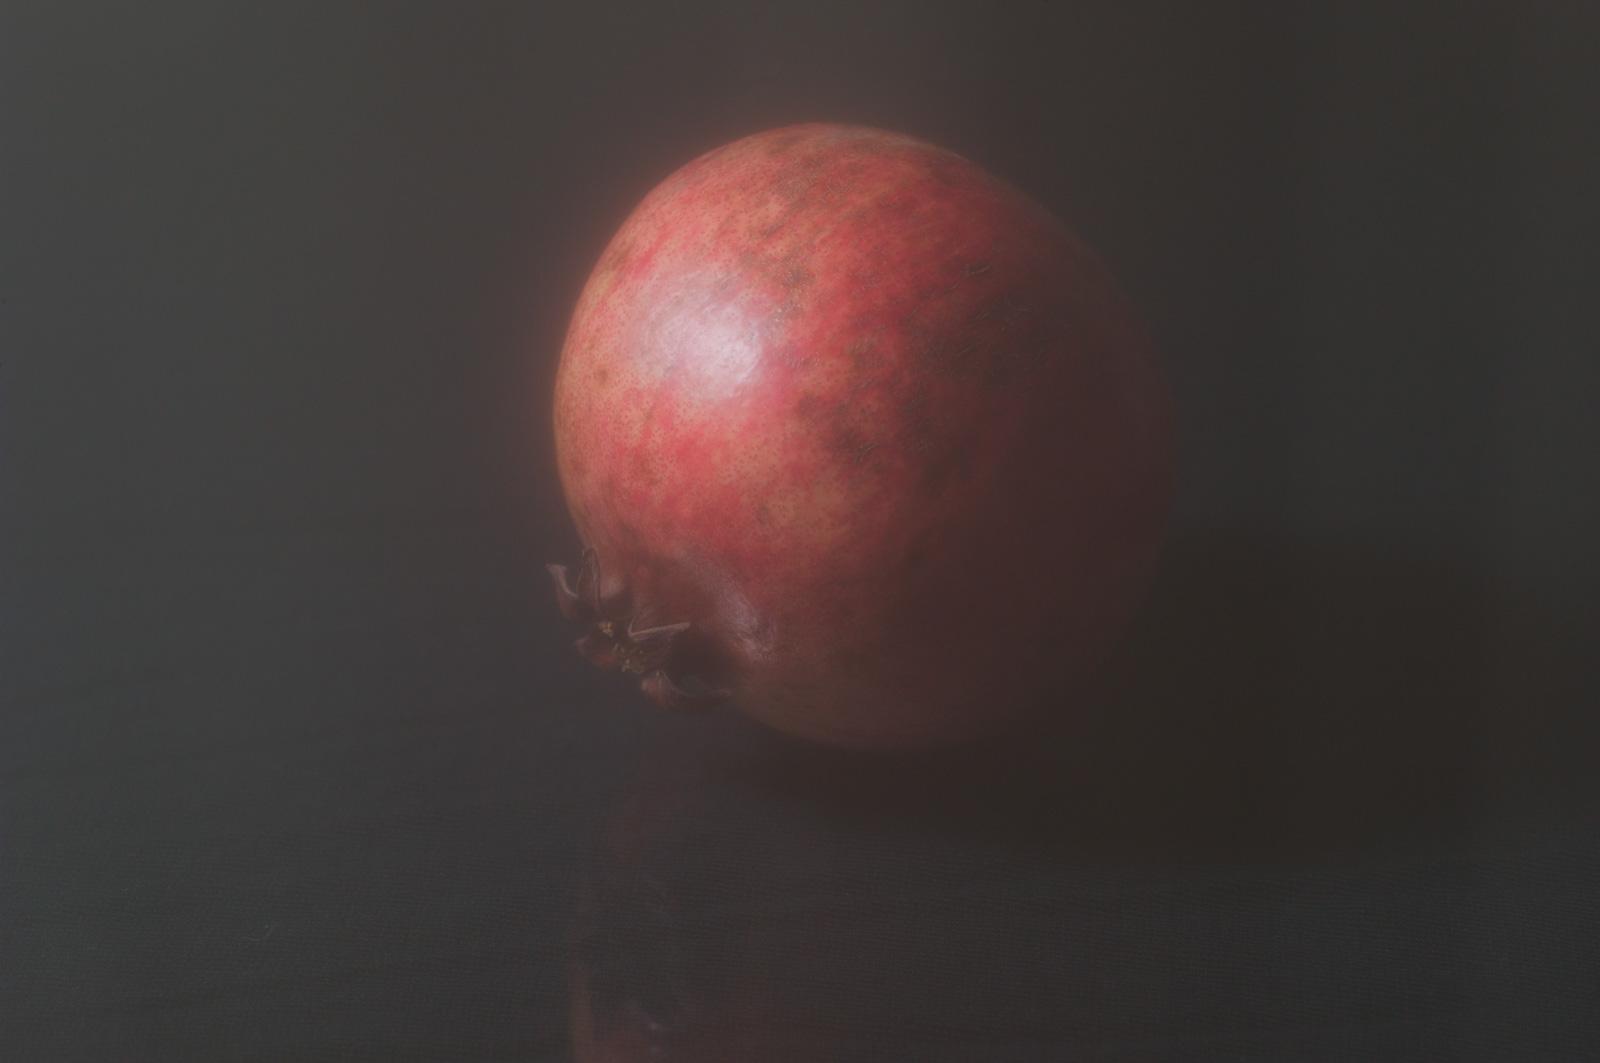 The fruit of the dead, 2019, Archival inkjet print mounted on aluminum, 90 x 140 cm, ed. 5 + AP